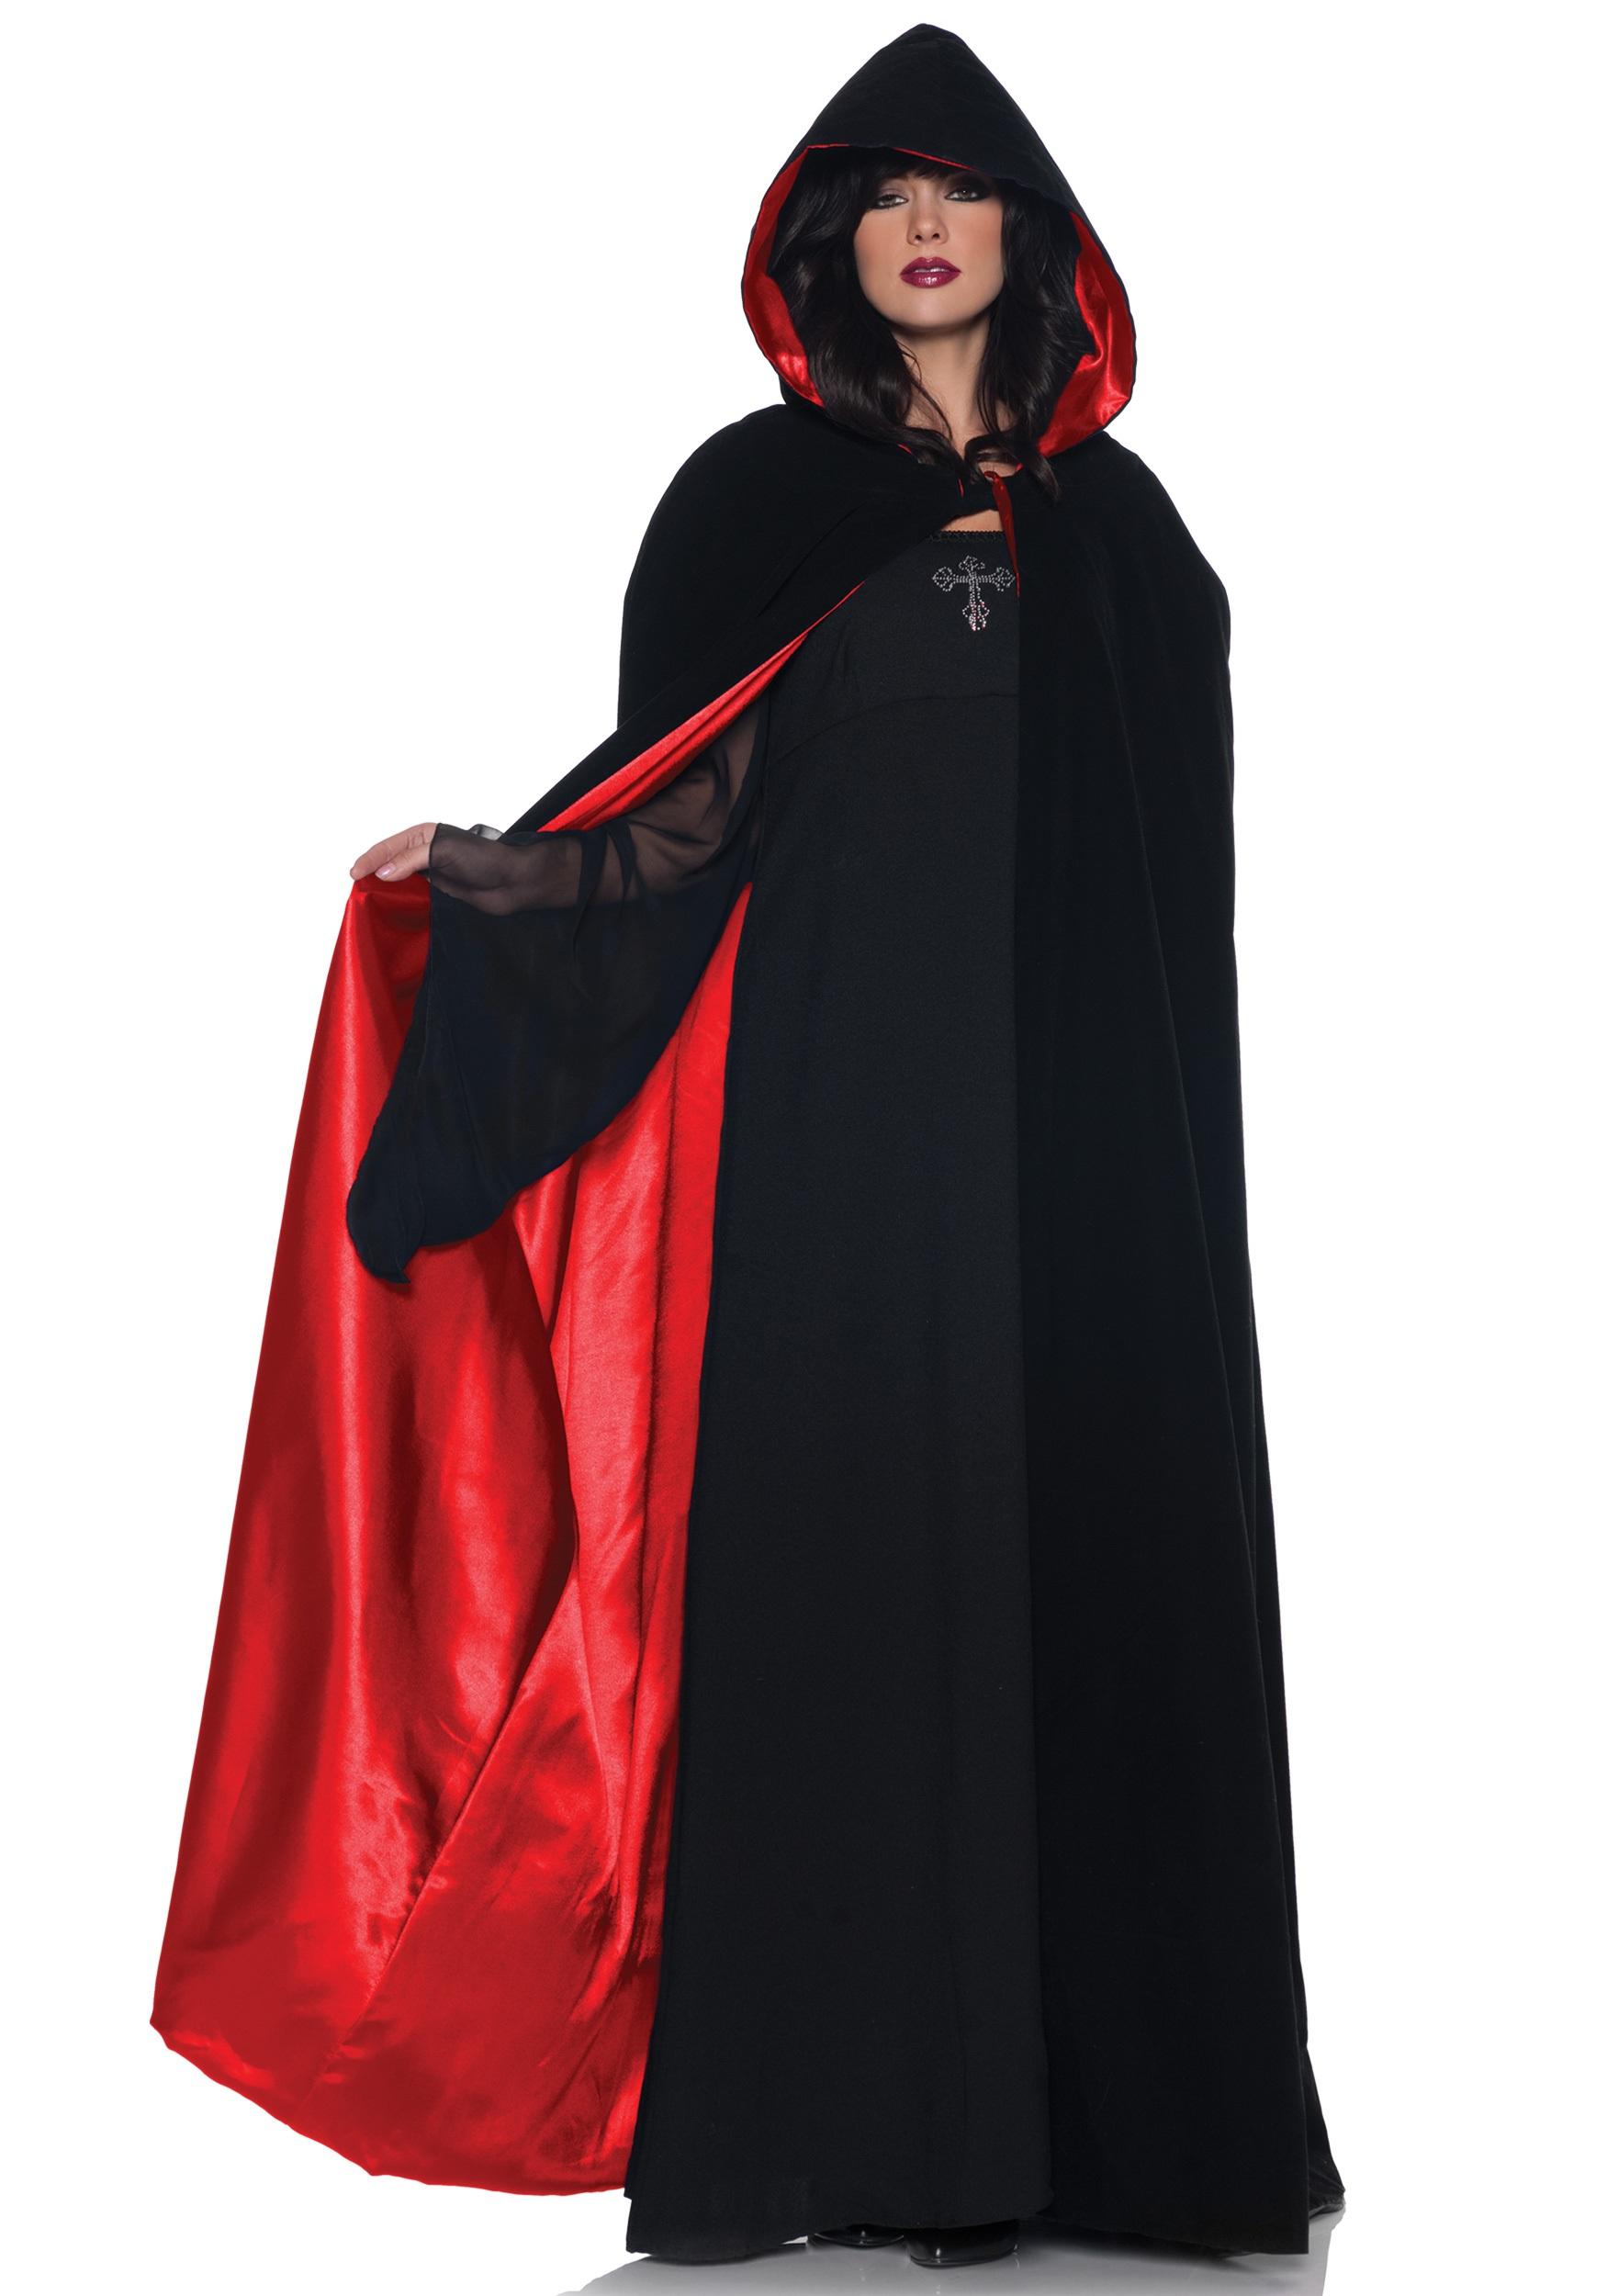 sc 1 st  Halloween Costumes & Deluxe Velvet Cape w/ Red Satin Lining